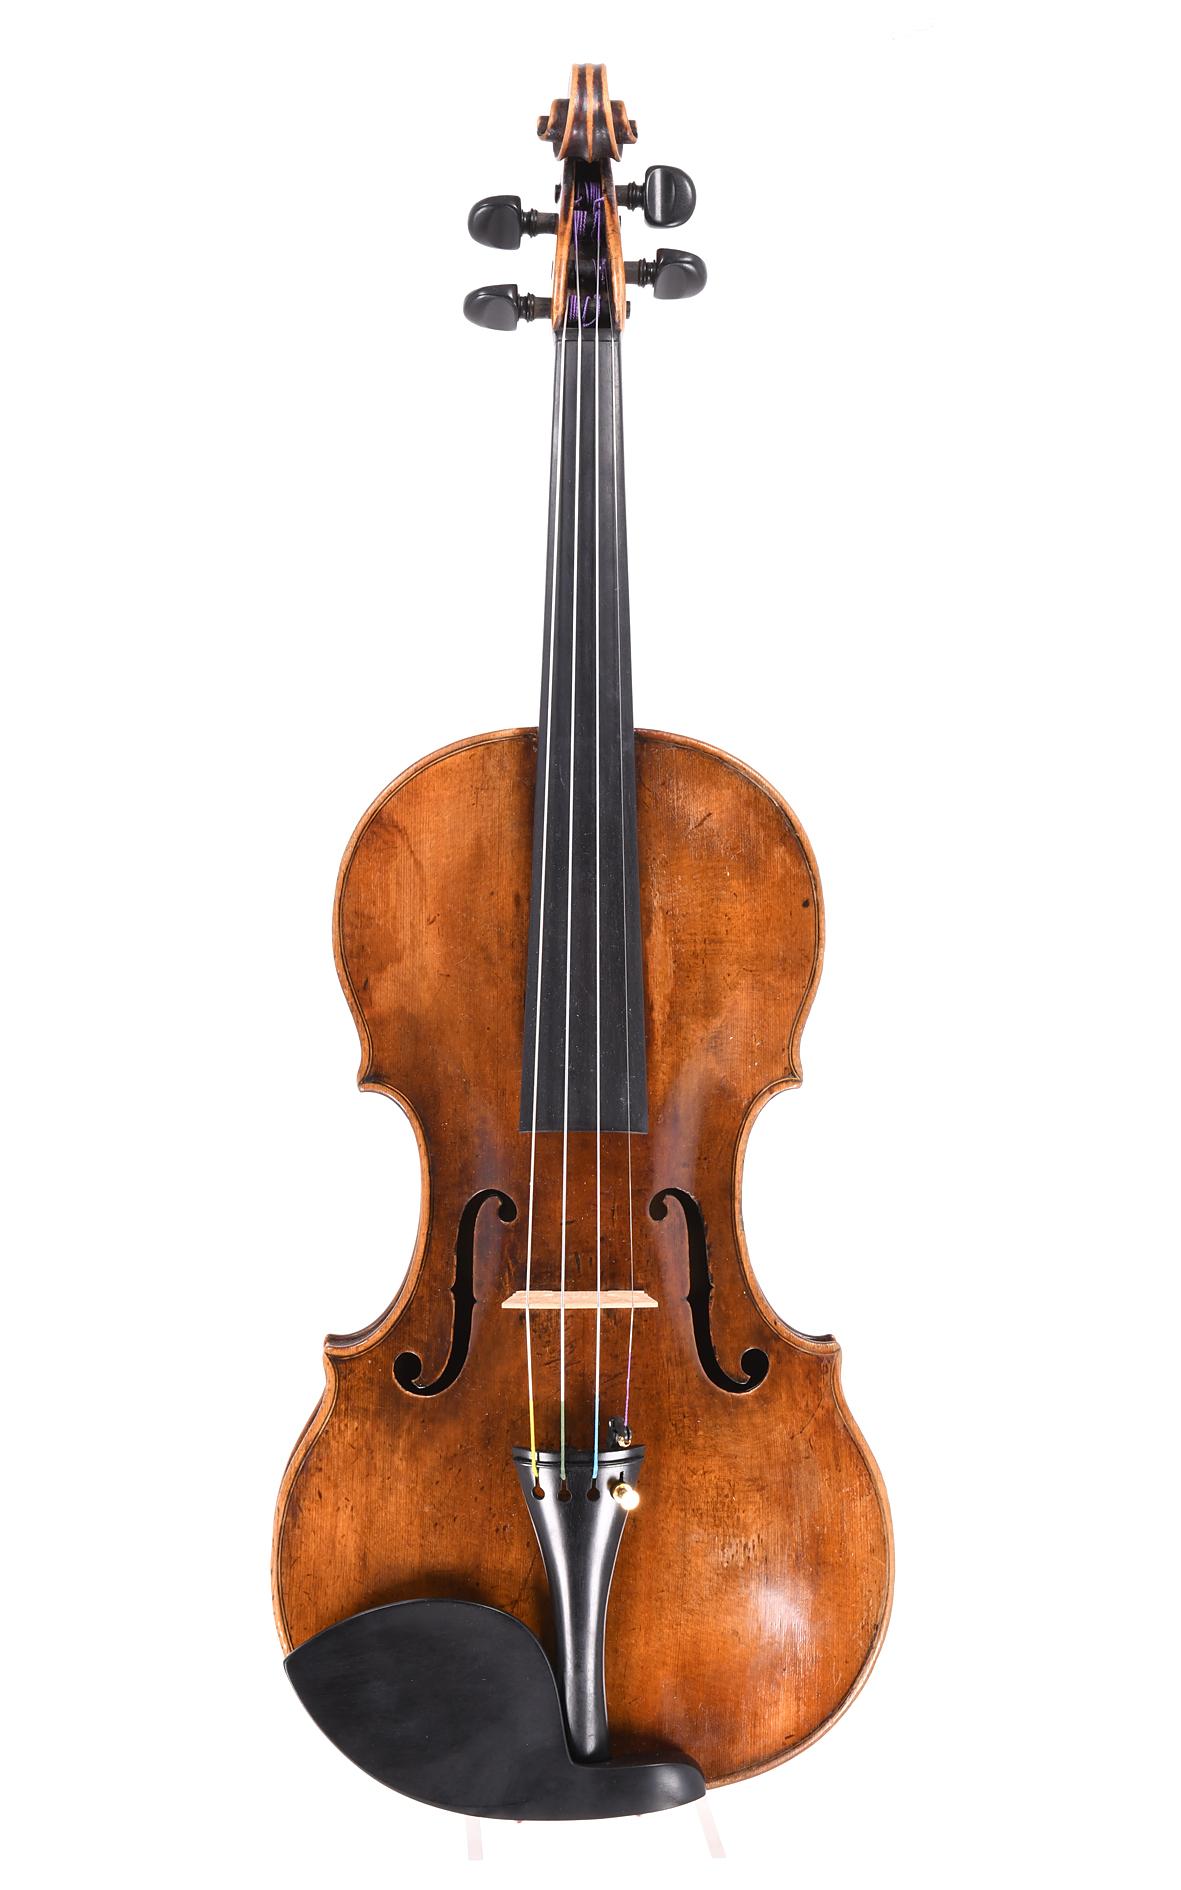 Violin by Sebastian Klotz